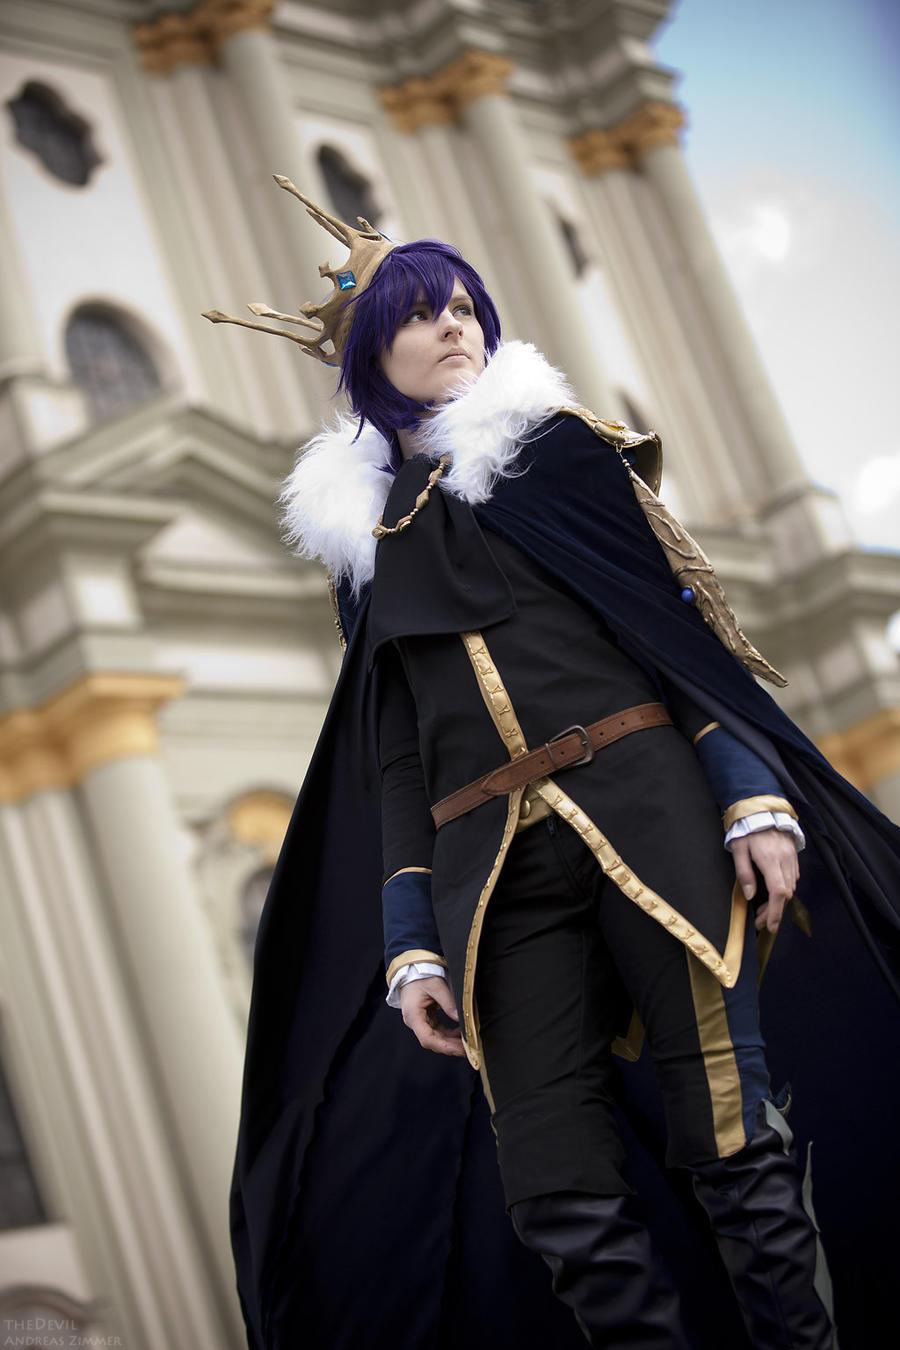 Viloftira - the Sable Prince by KashinoRei